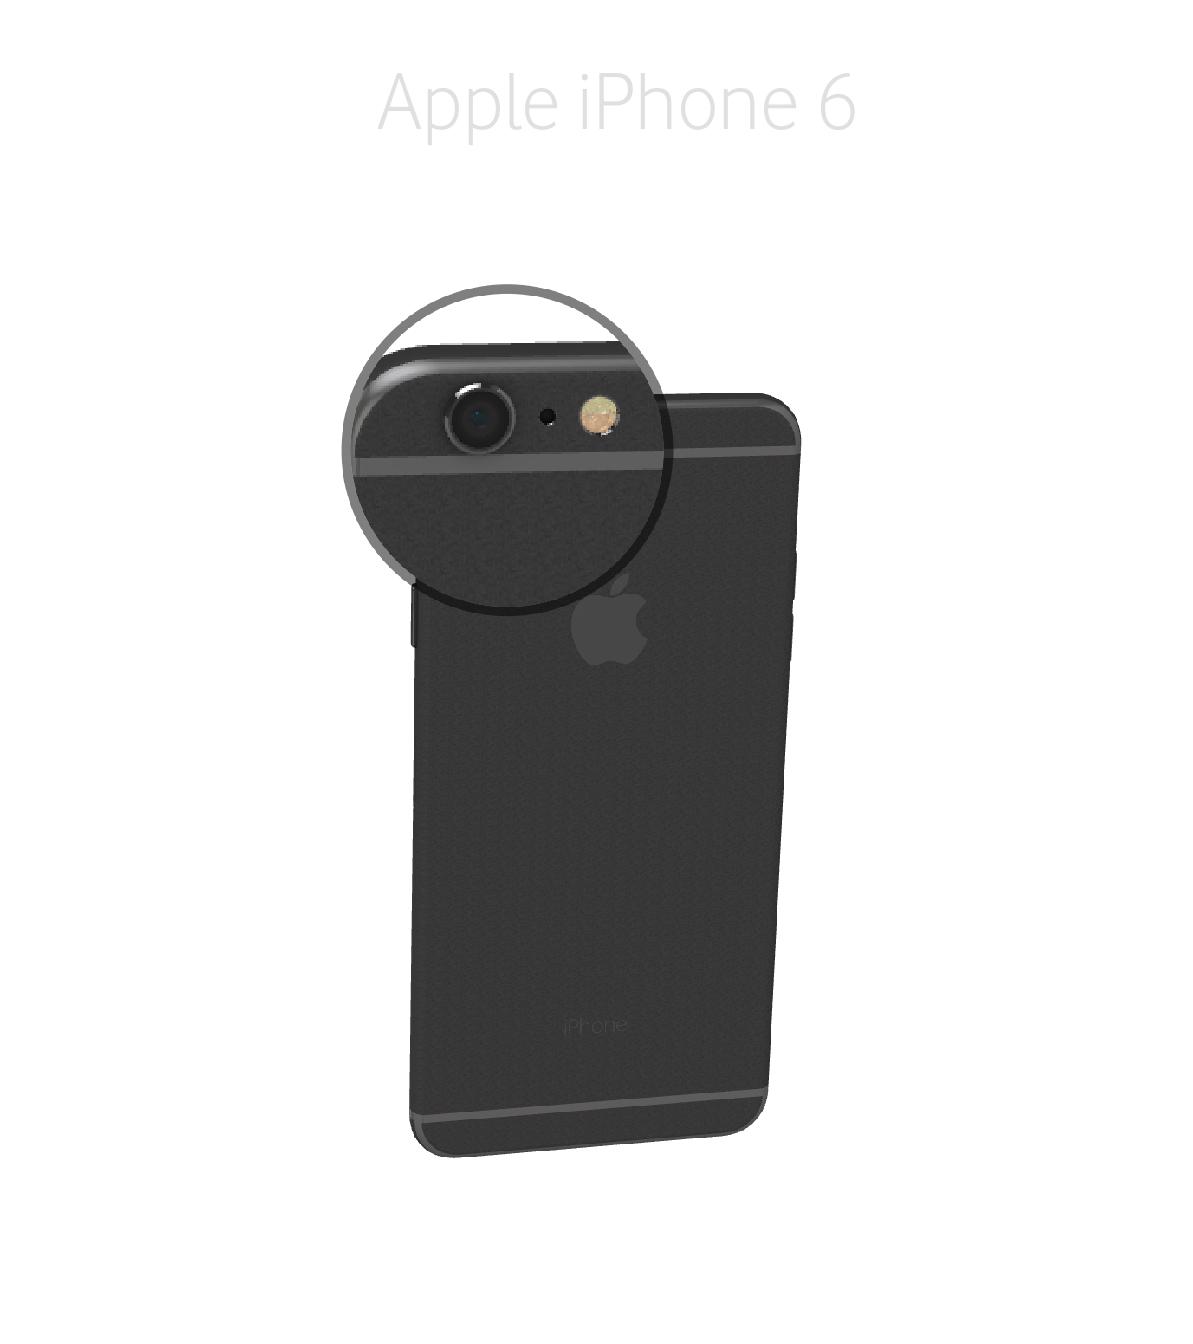 Laga kamera iPhone 6